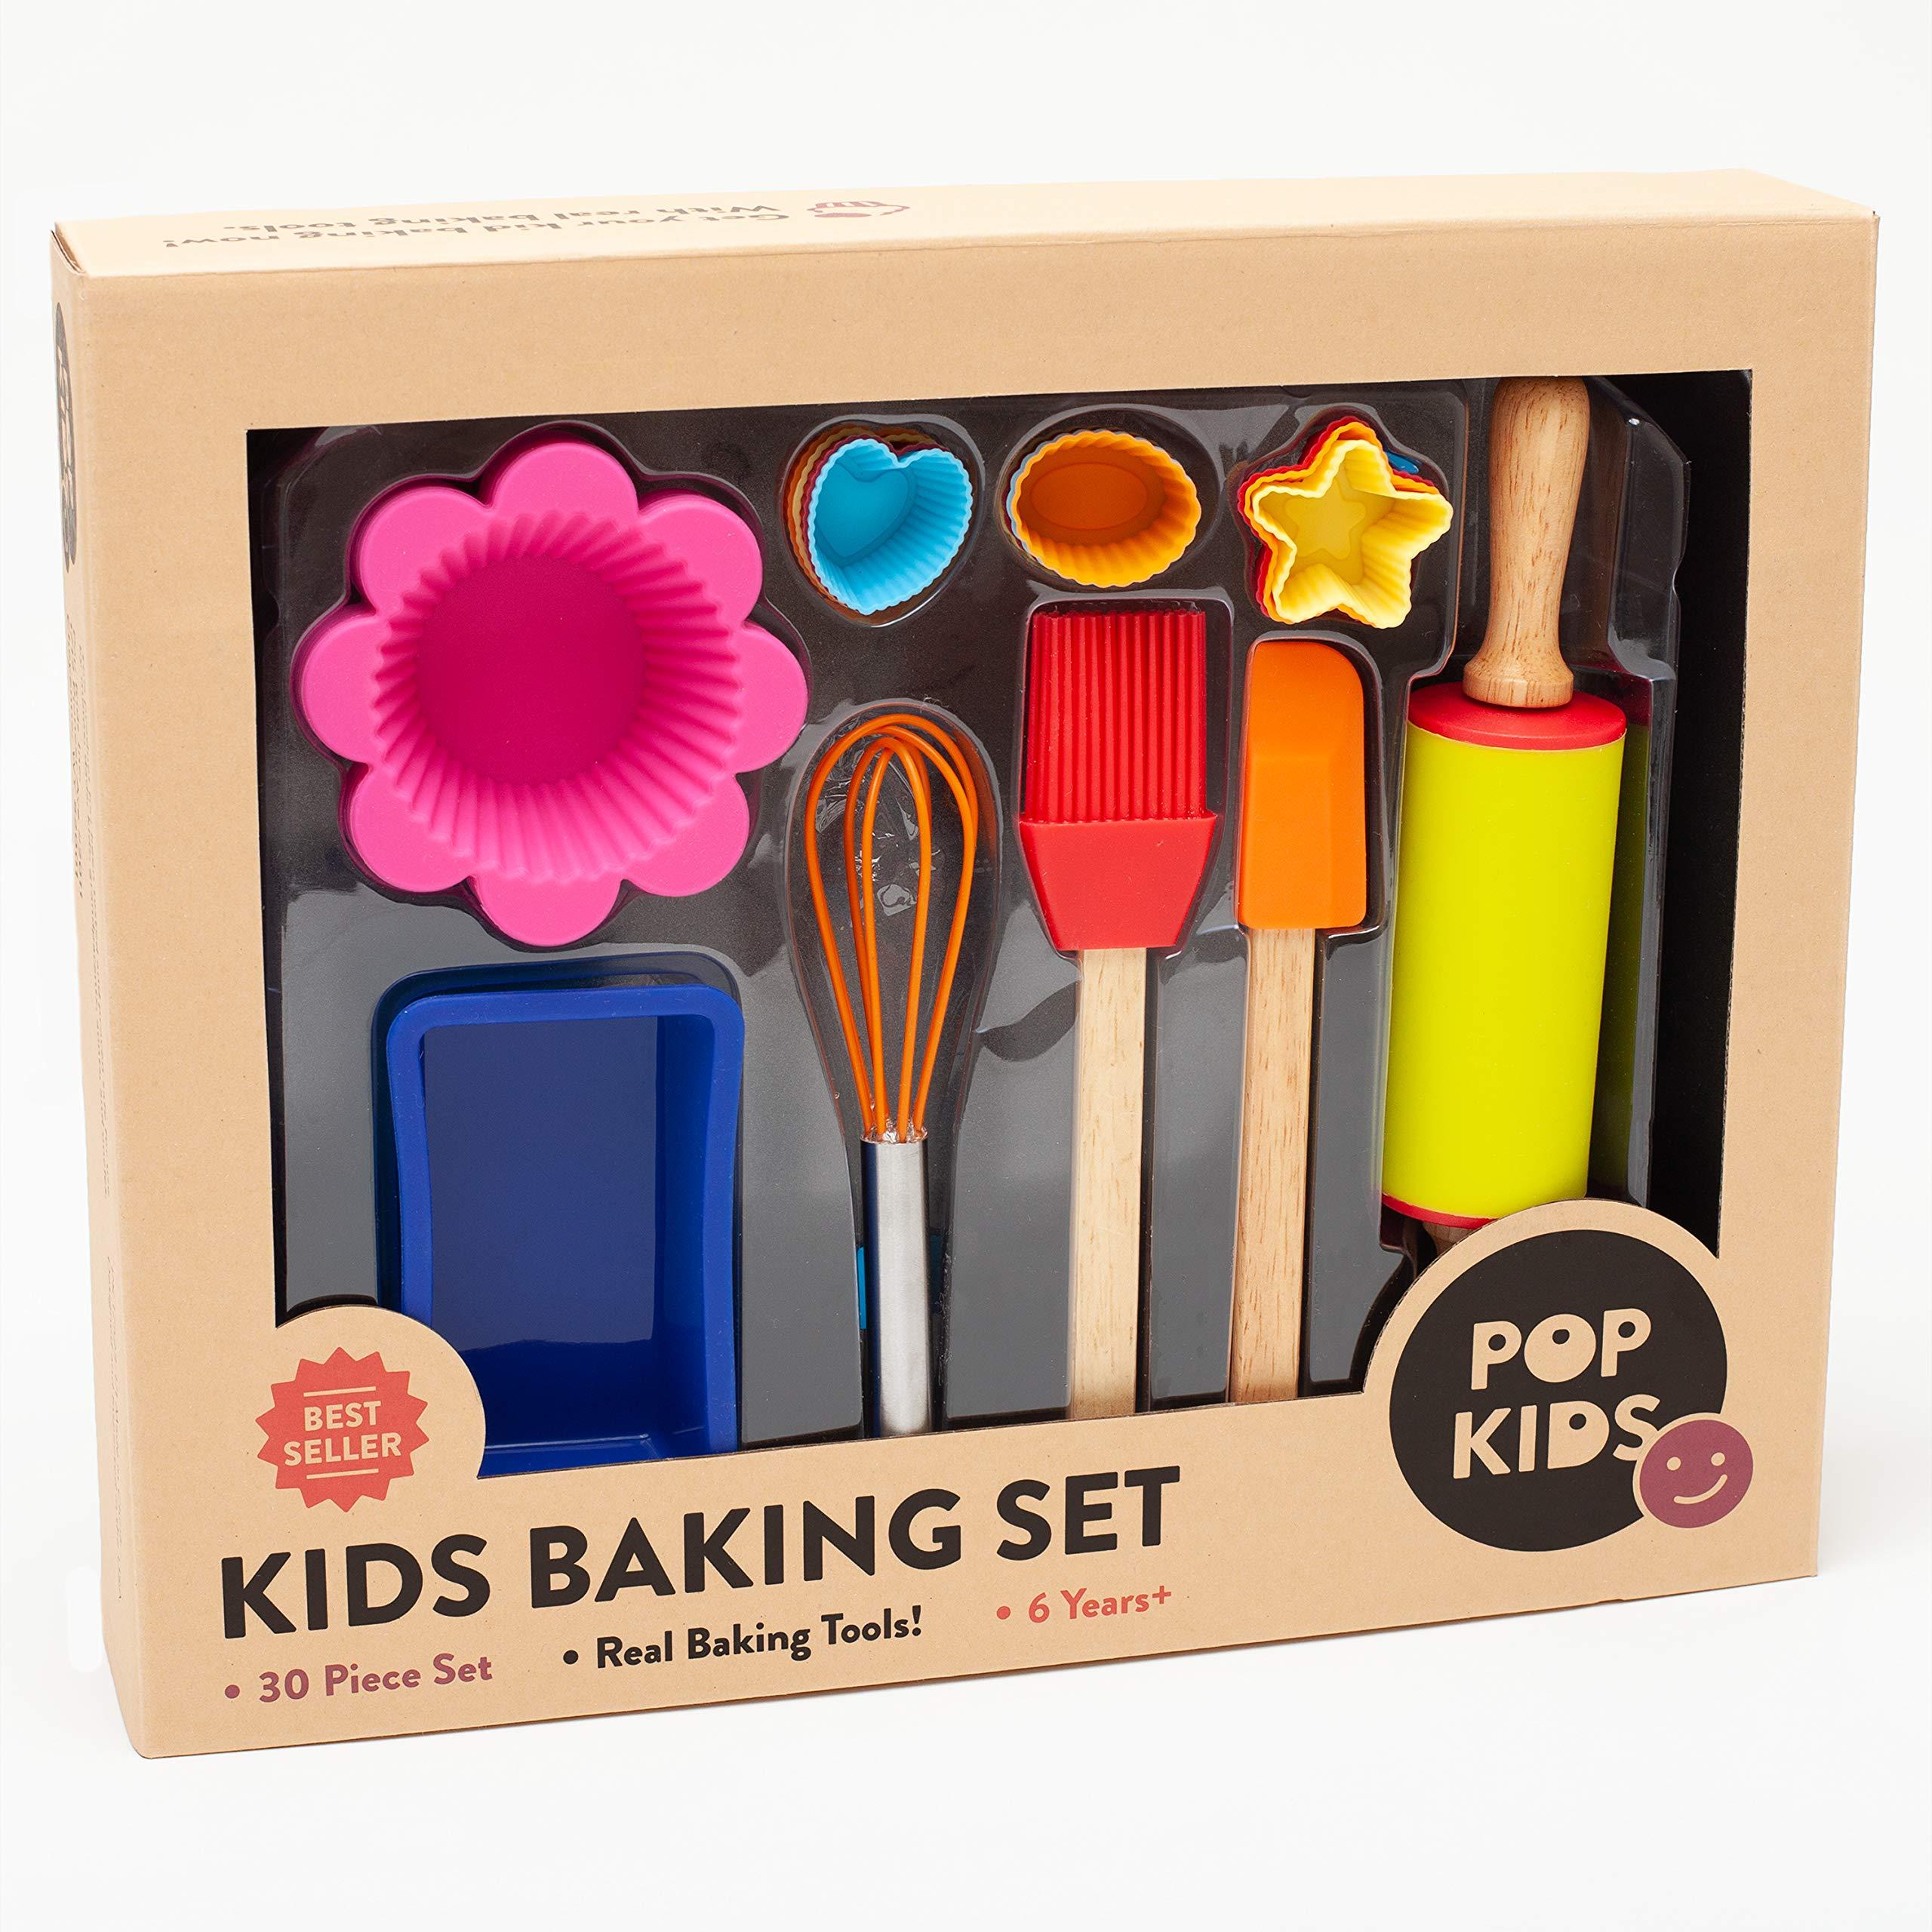 30-Piece Pop Kid's Baking Set for Family Fun Premium Kit for Children Learning to Bake by Pop Kids